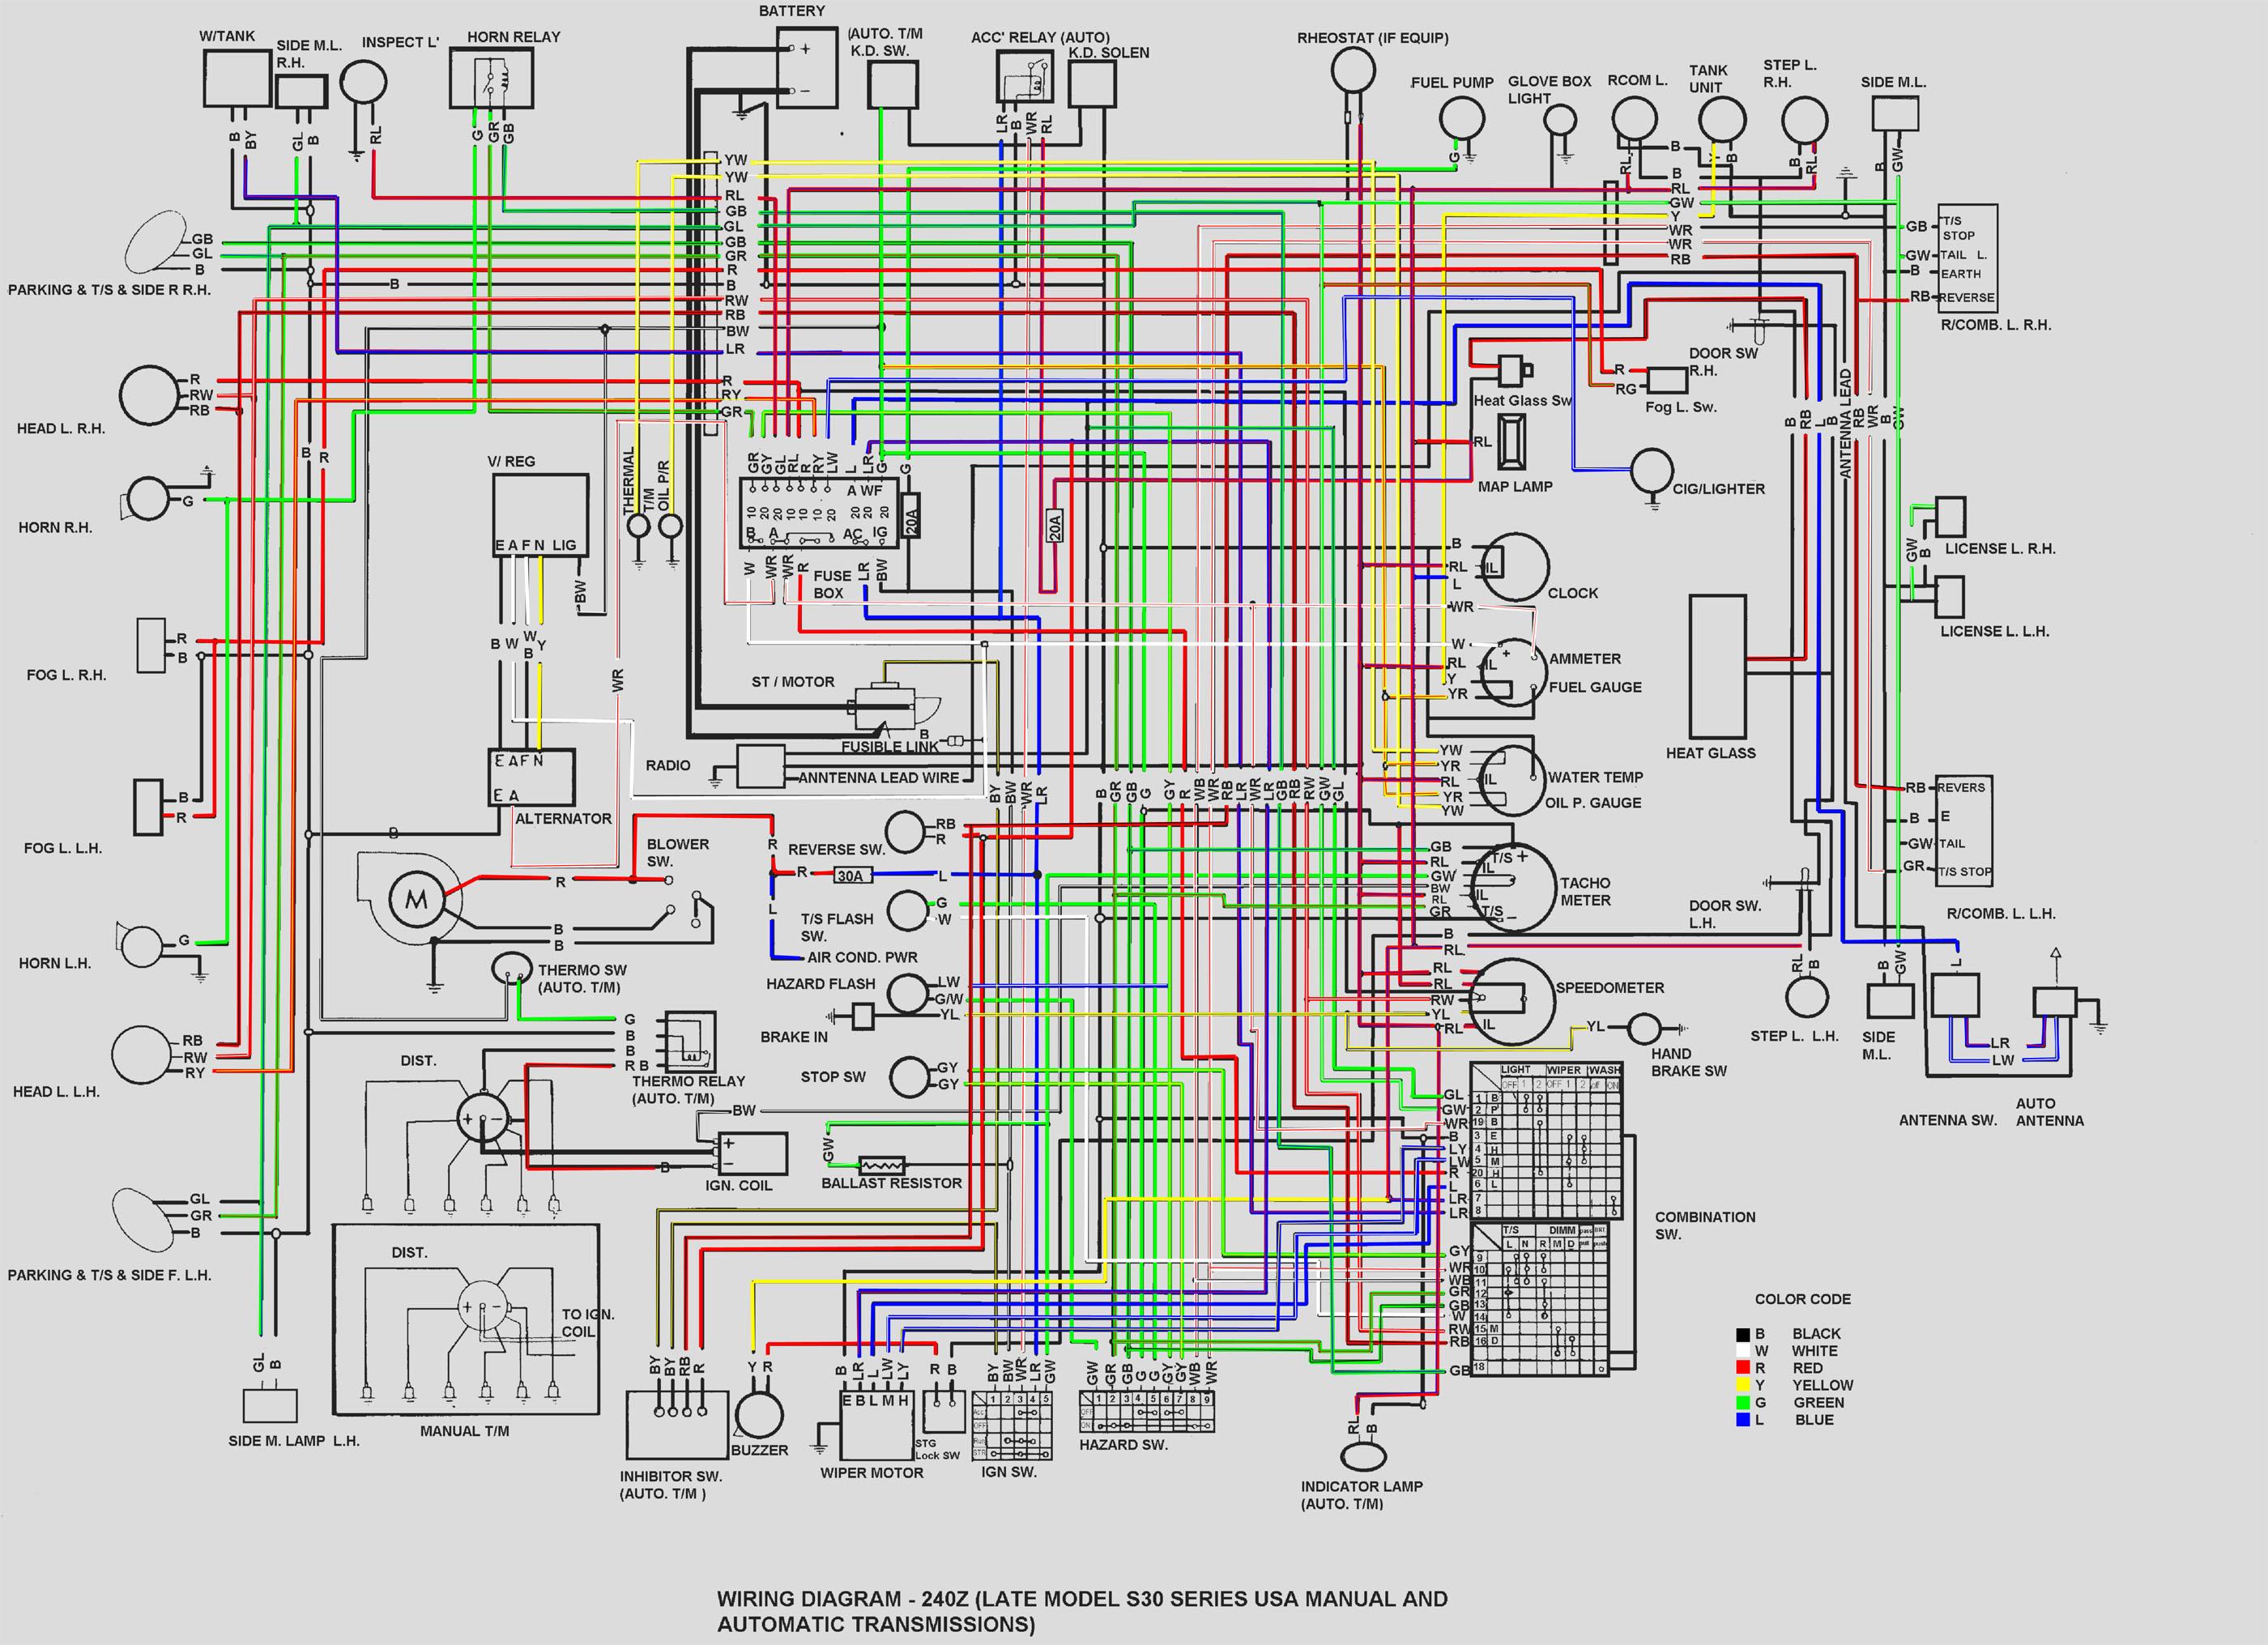 Excellent 1978 Datsun 280Z Wiring Diagram Online Wiring Diagram Wiring Cloud Icalpermsplehendilmohammedshrineorg